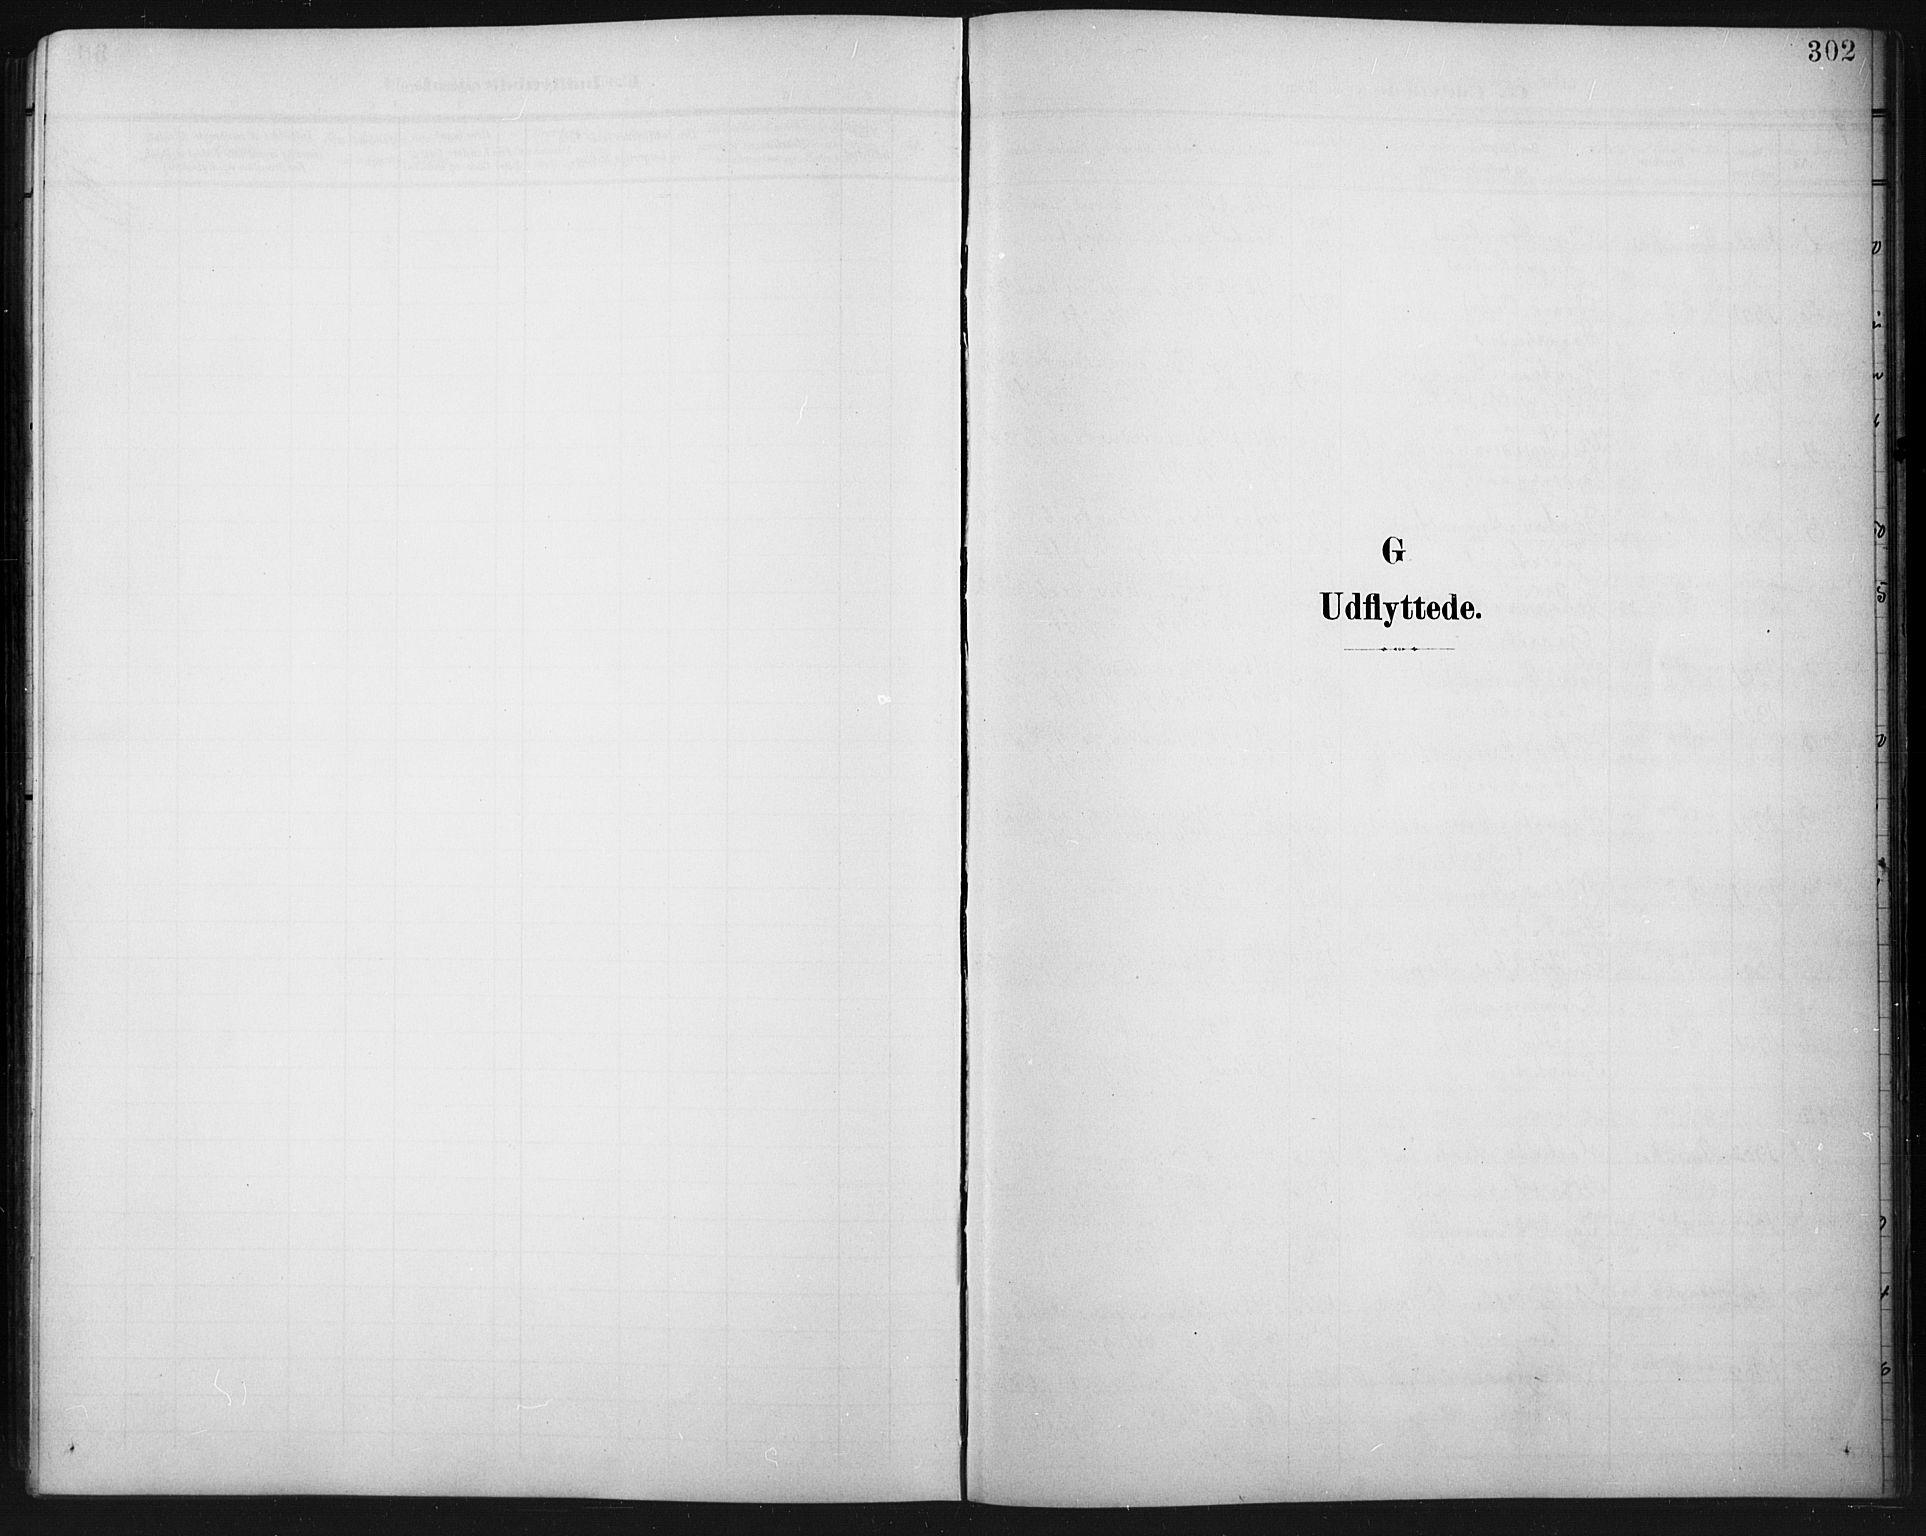 SAH, Fåberg prestekontor, Klokkerbok nr. 11, 1901-1921, s. 302